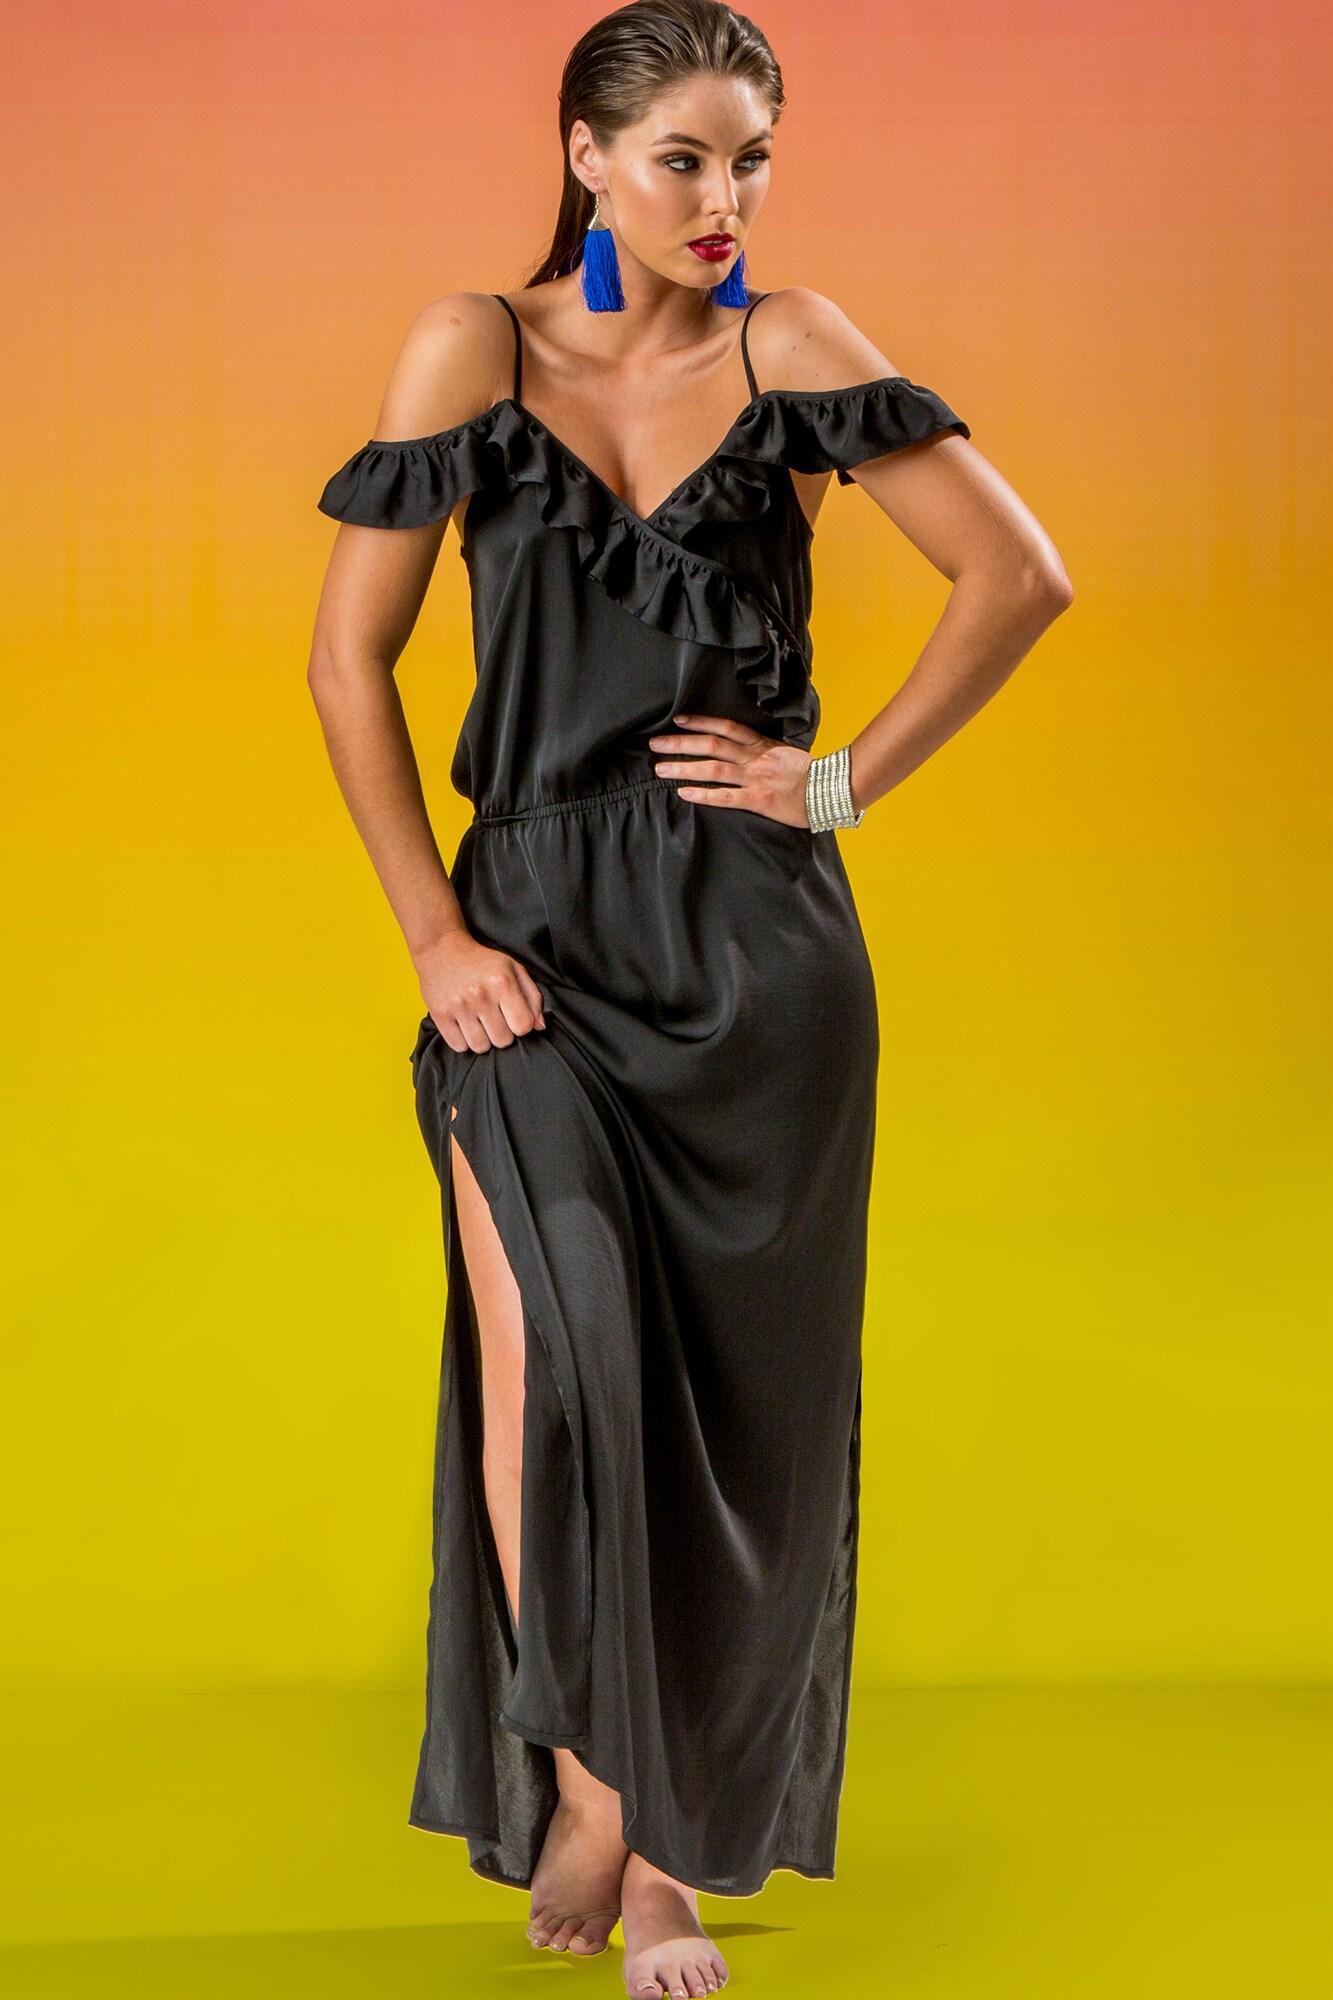 Mardi Gras Dress - Black